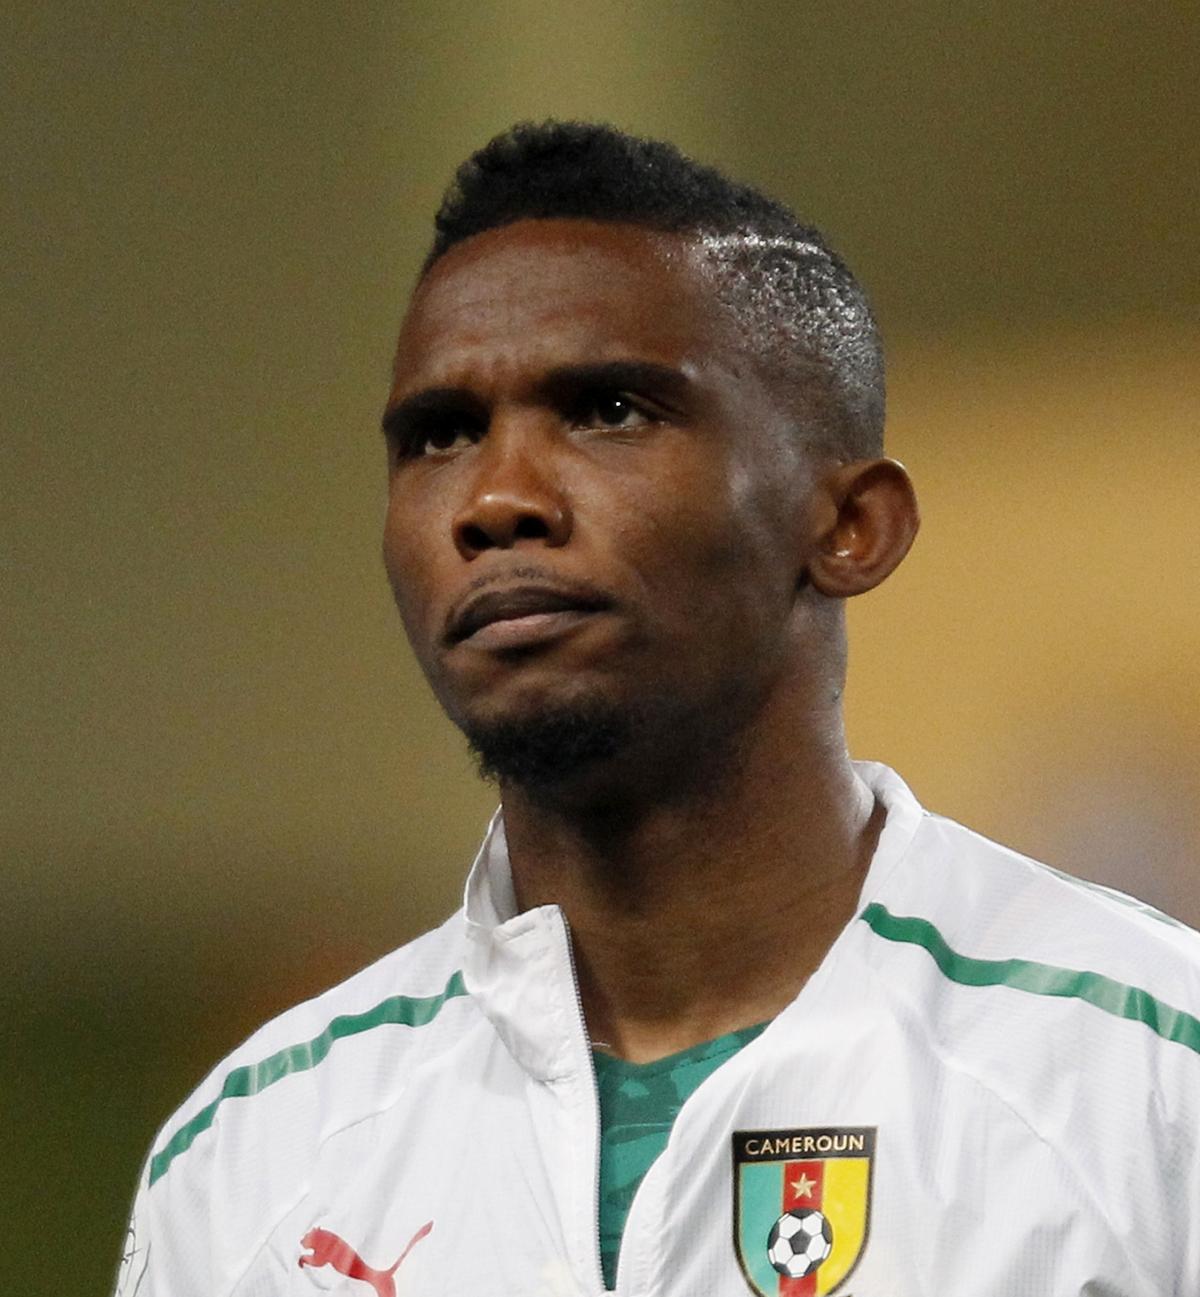 Cameroon forward Samuel Eto'o (Reuters)